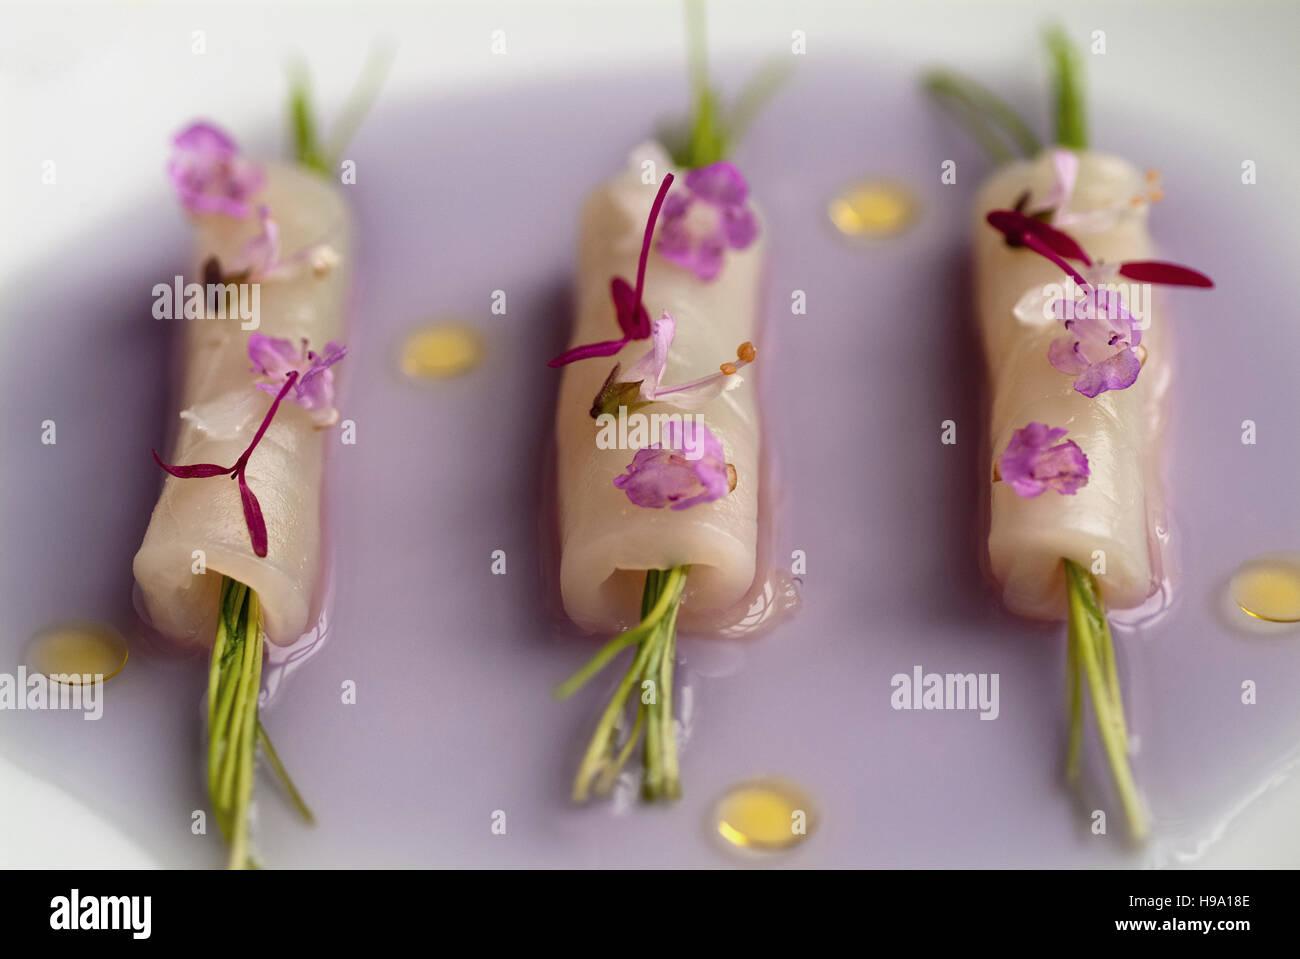 Raw scallop ravioli in a purple cauliflower consume at Restaurant Andre in Singapore - Stock Image